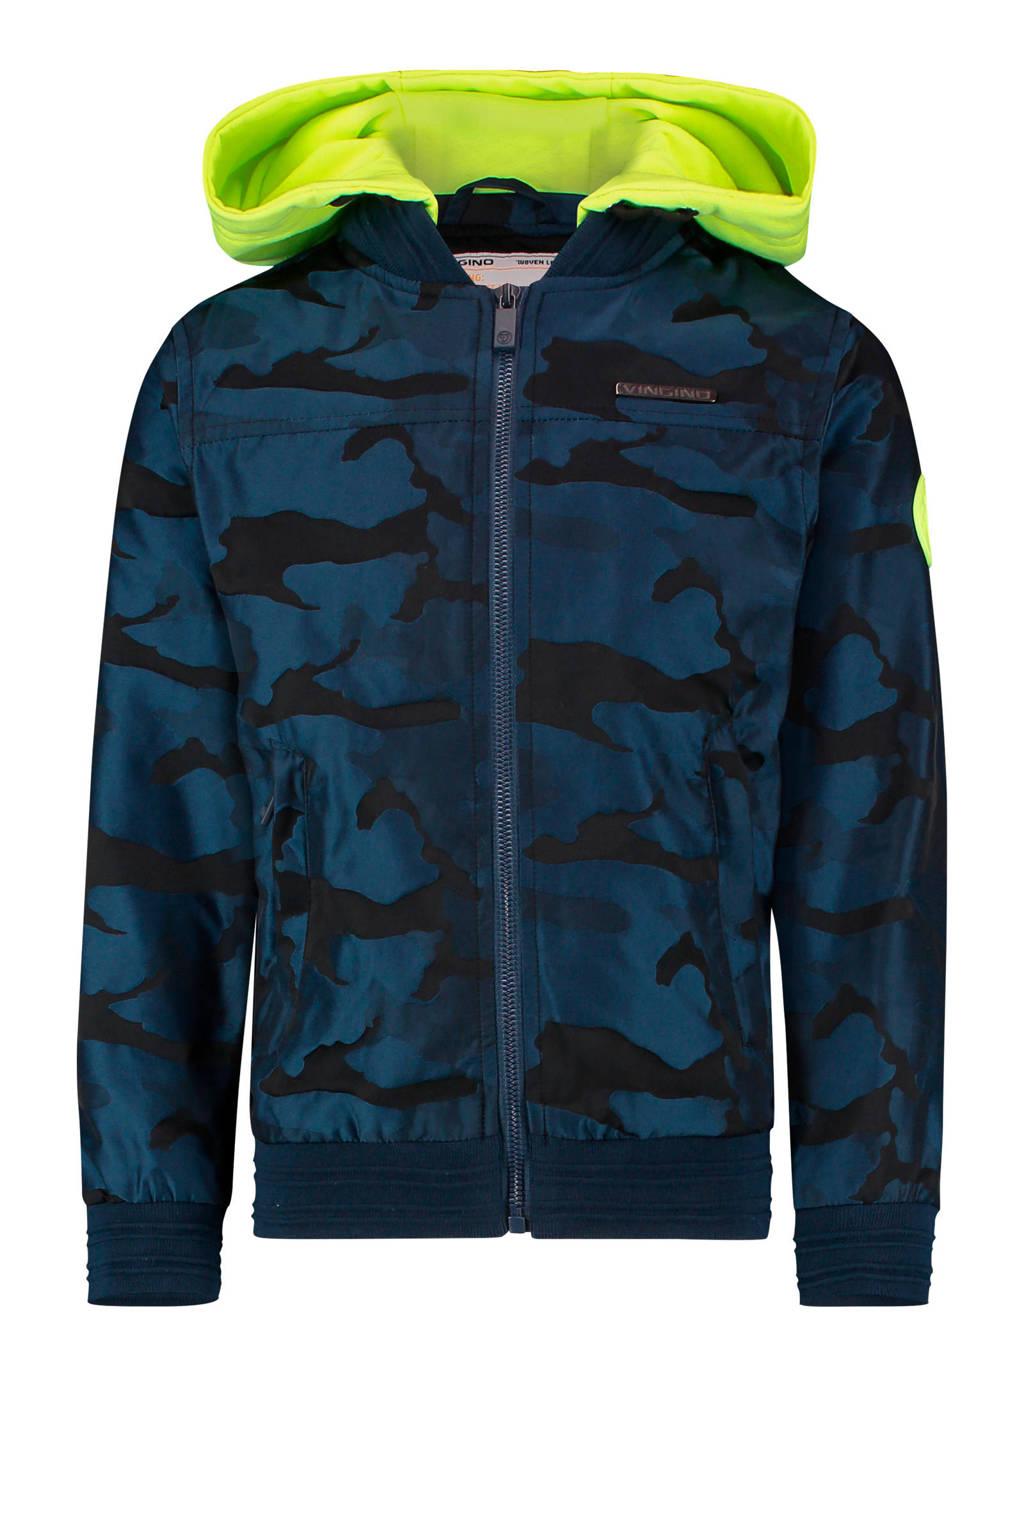 Vingino zomerjas Thessel met camouflageprint donkerblauw/neon geel, Donkerblauw/neon geel